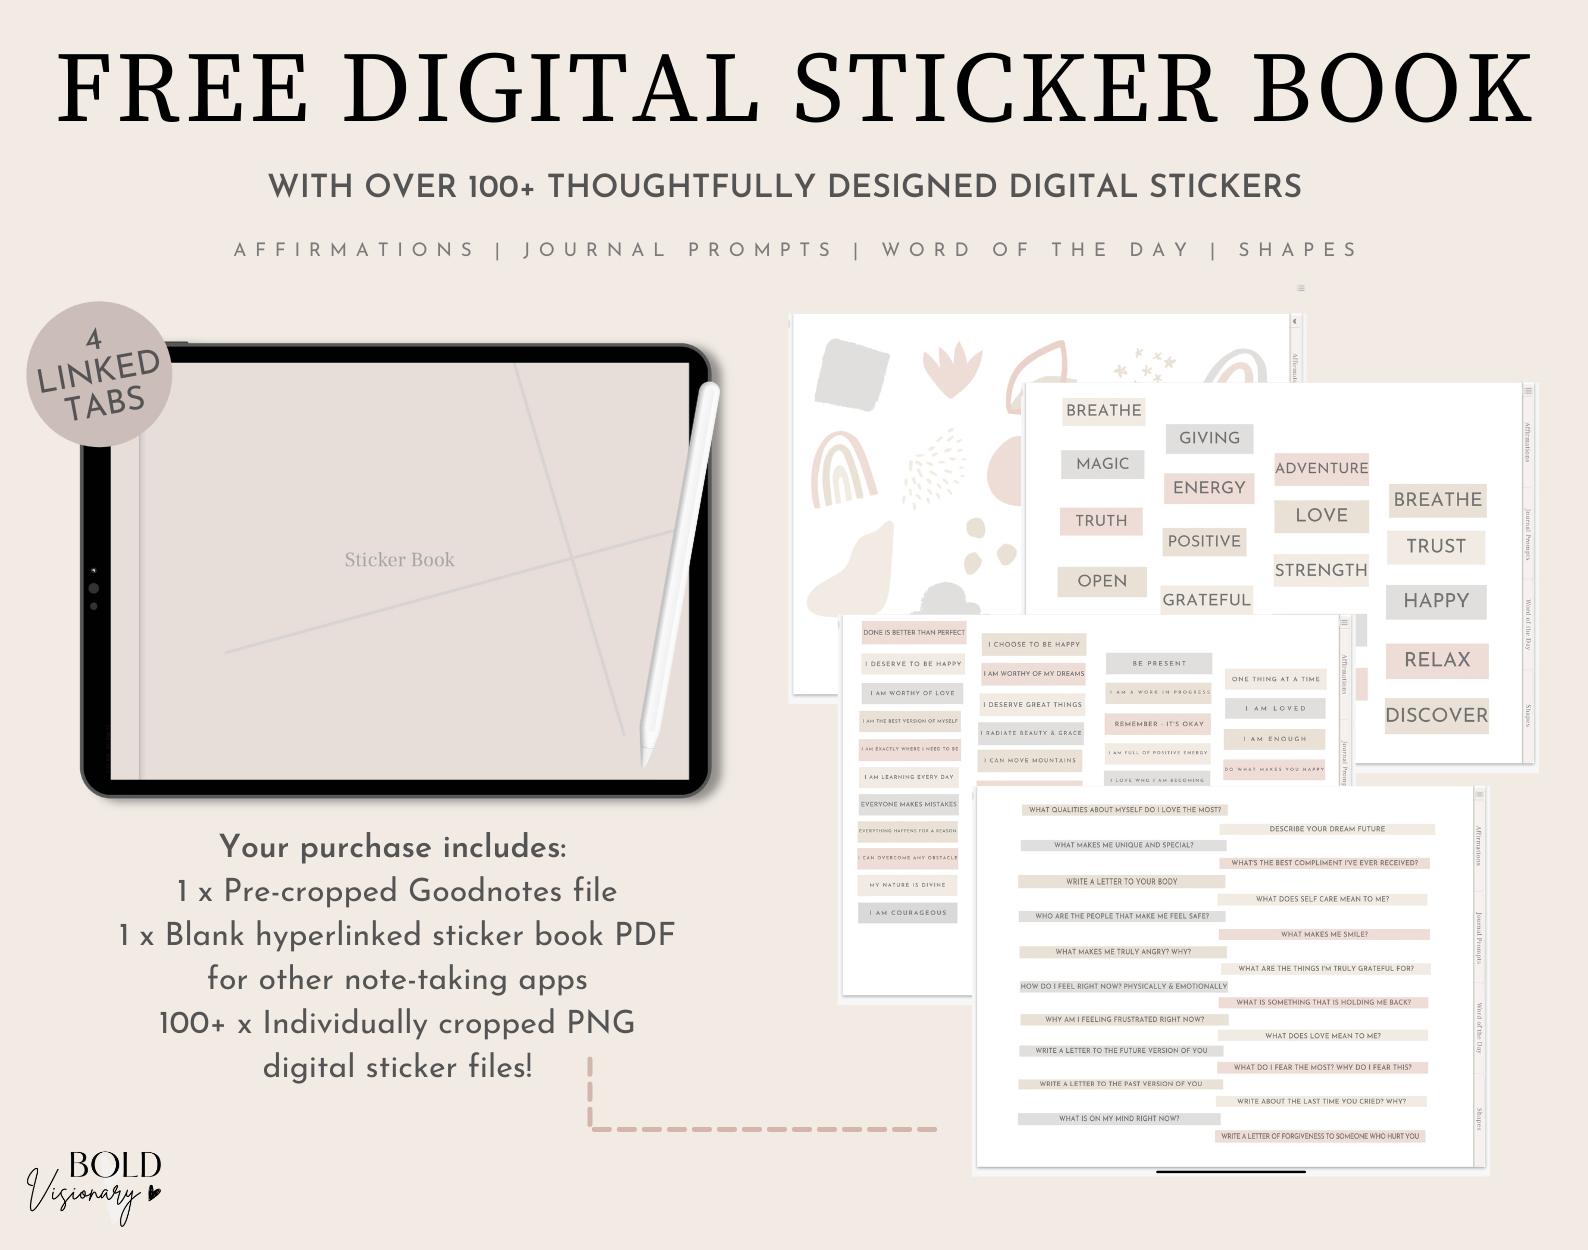 8Digital-Sticker-Book-Bold-Visionary-Digital-Gratitude-Journal